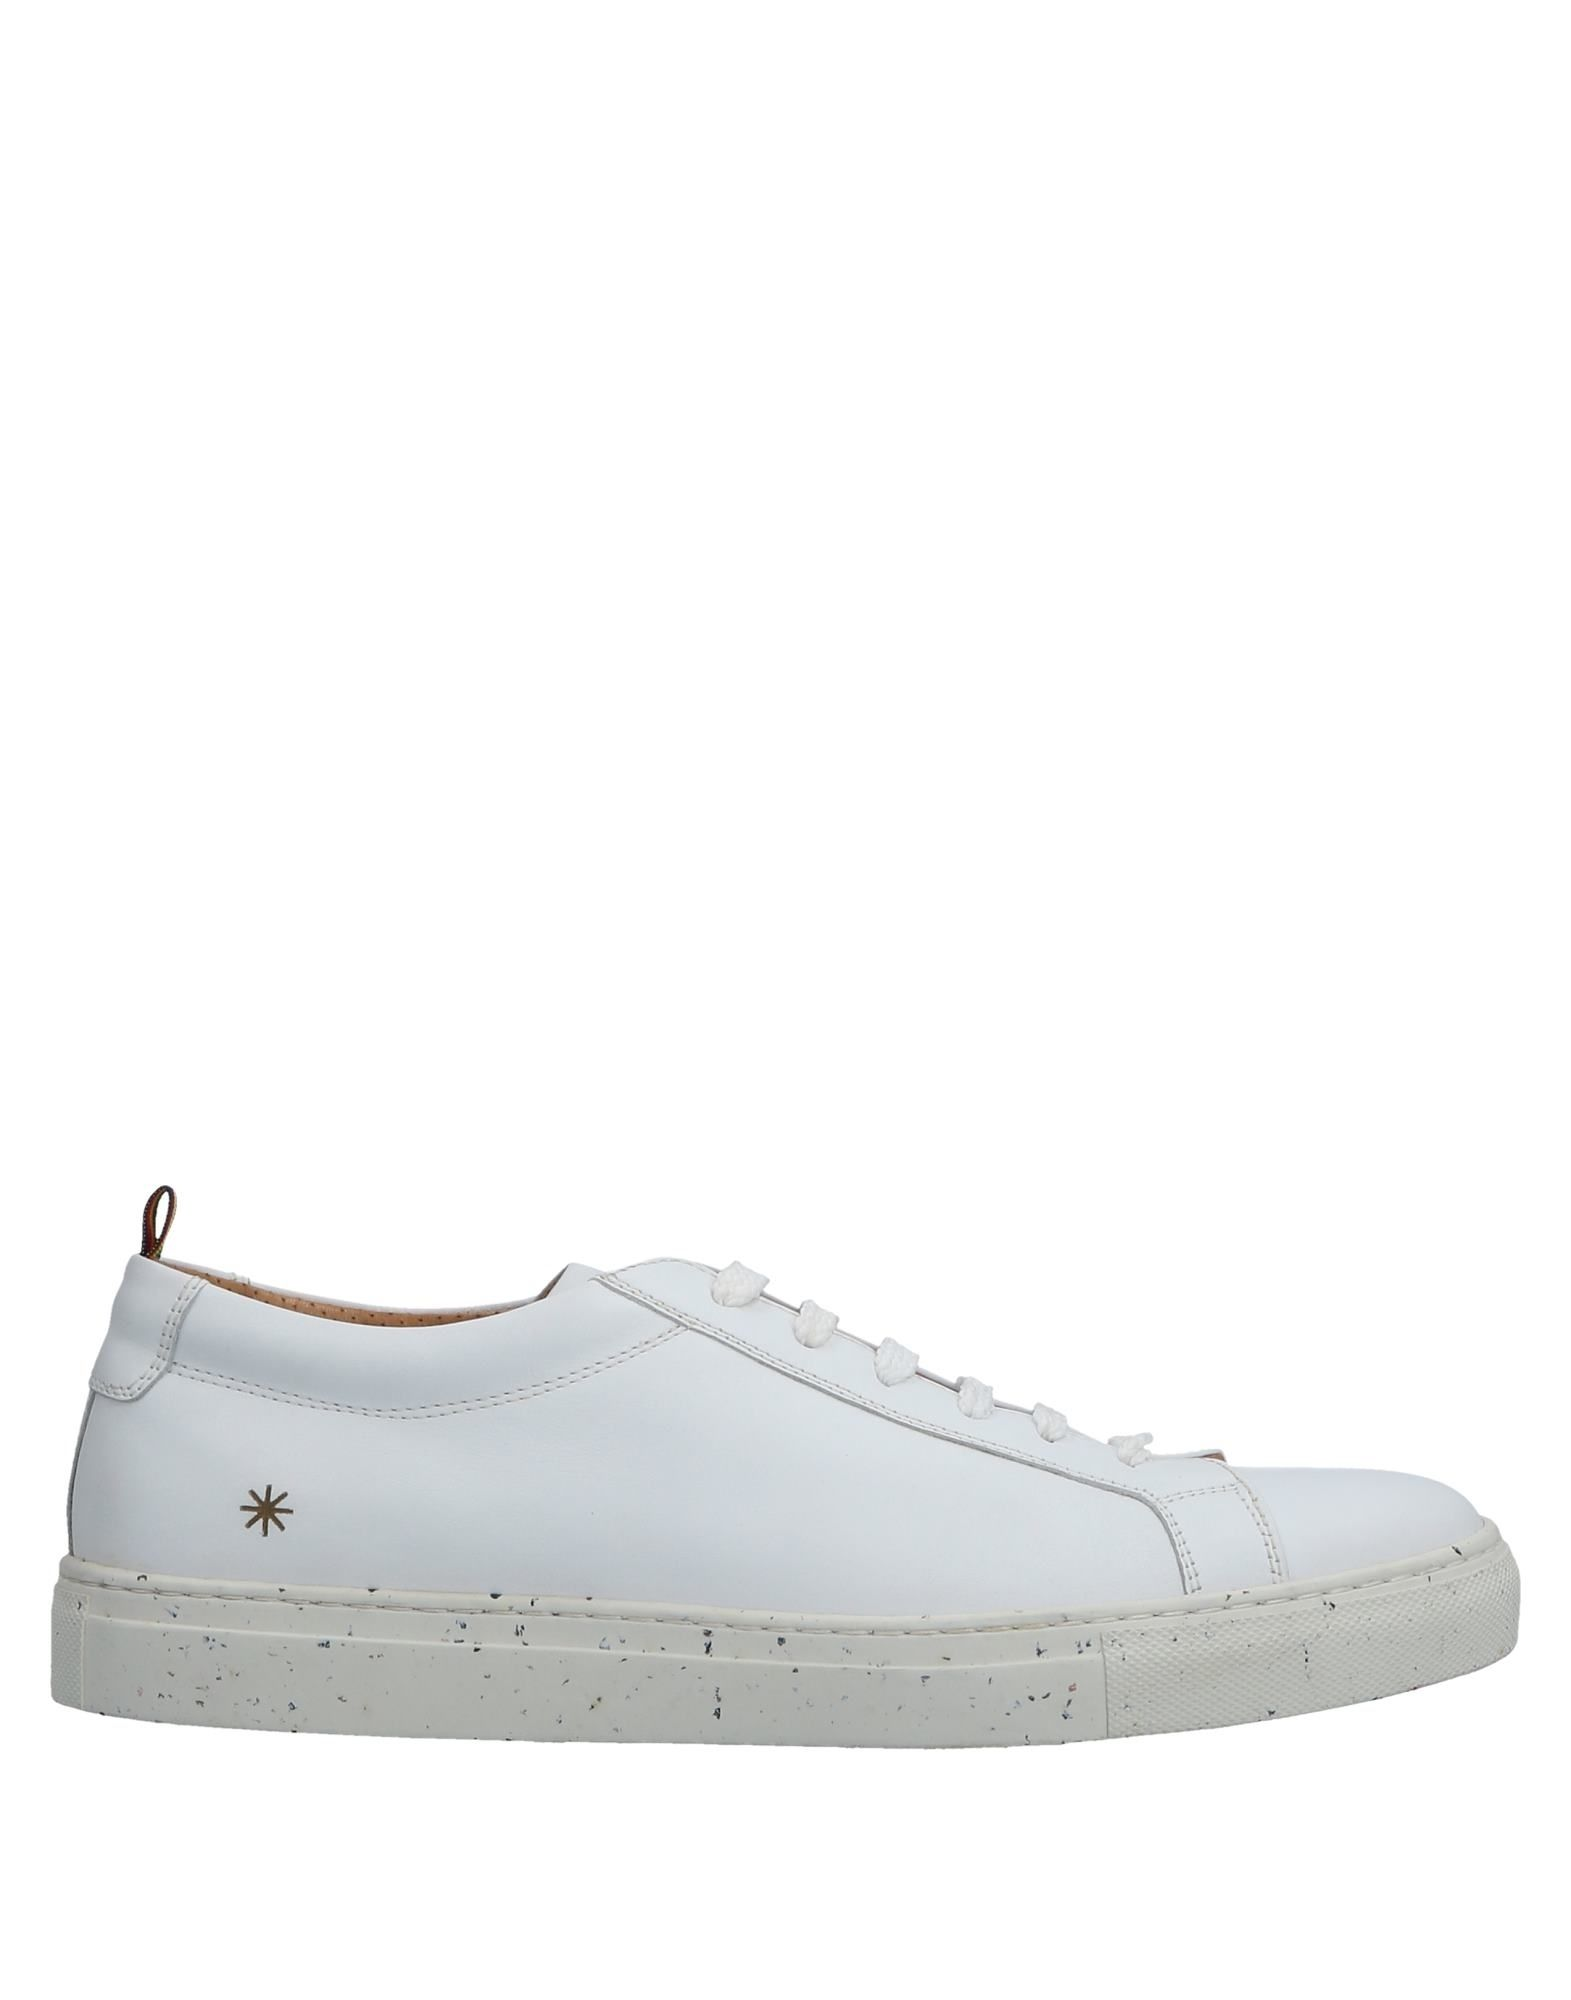 Sneakers Manuel Ritz Uomo - 11531332KN